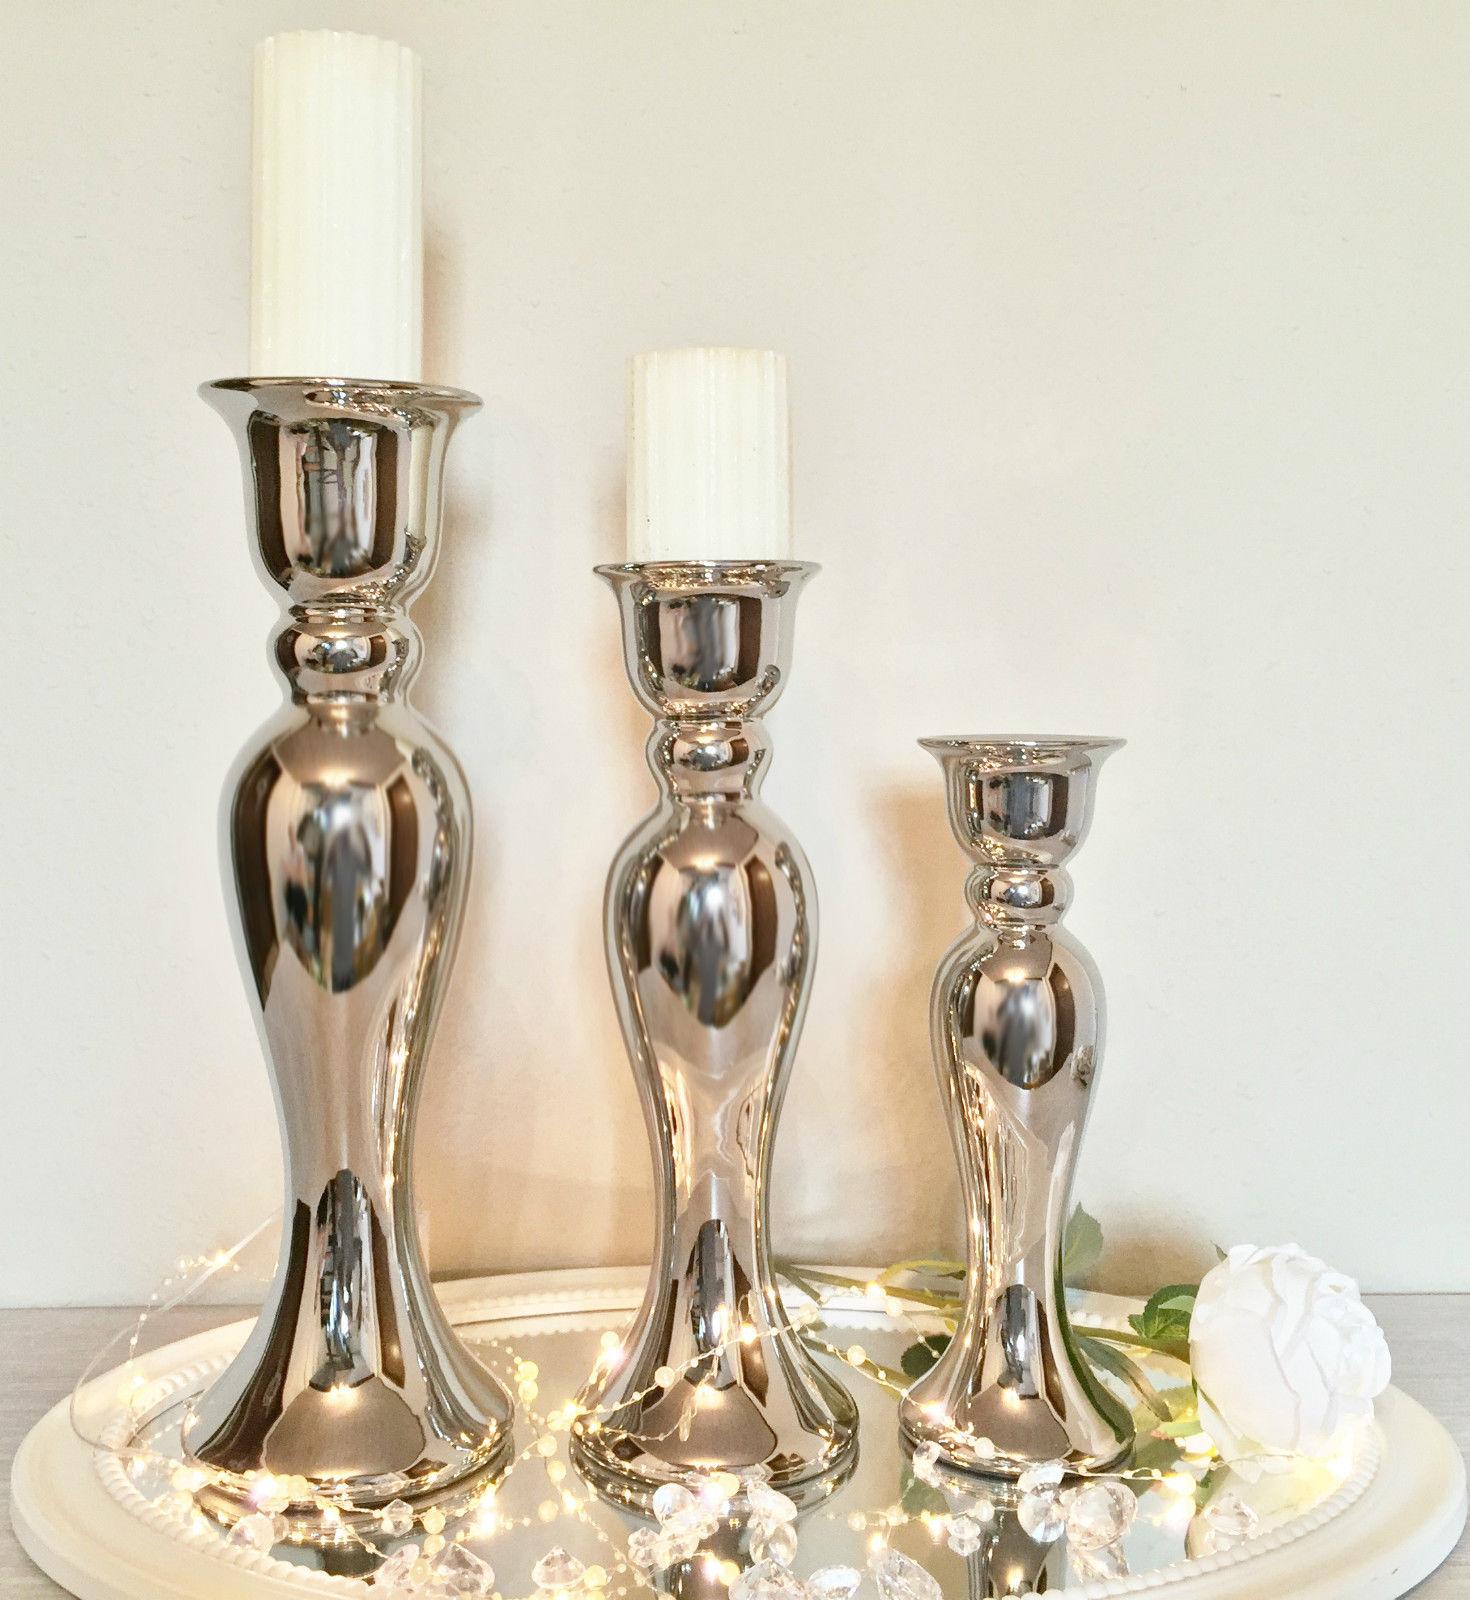 Ceramica candelabro candeliere argento bianco supporto candela ...